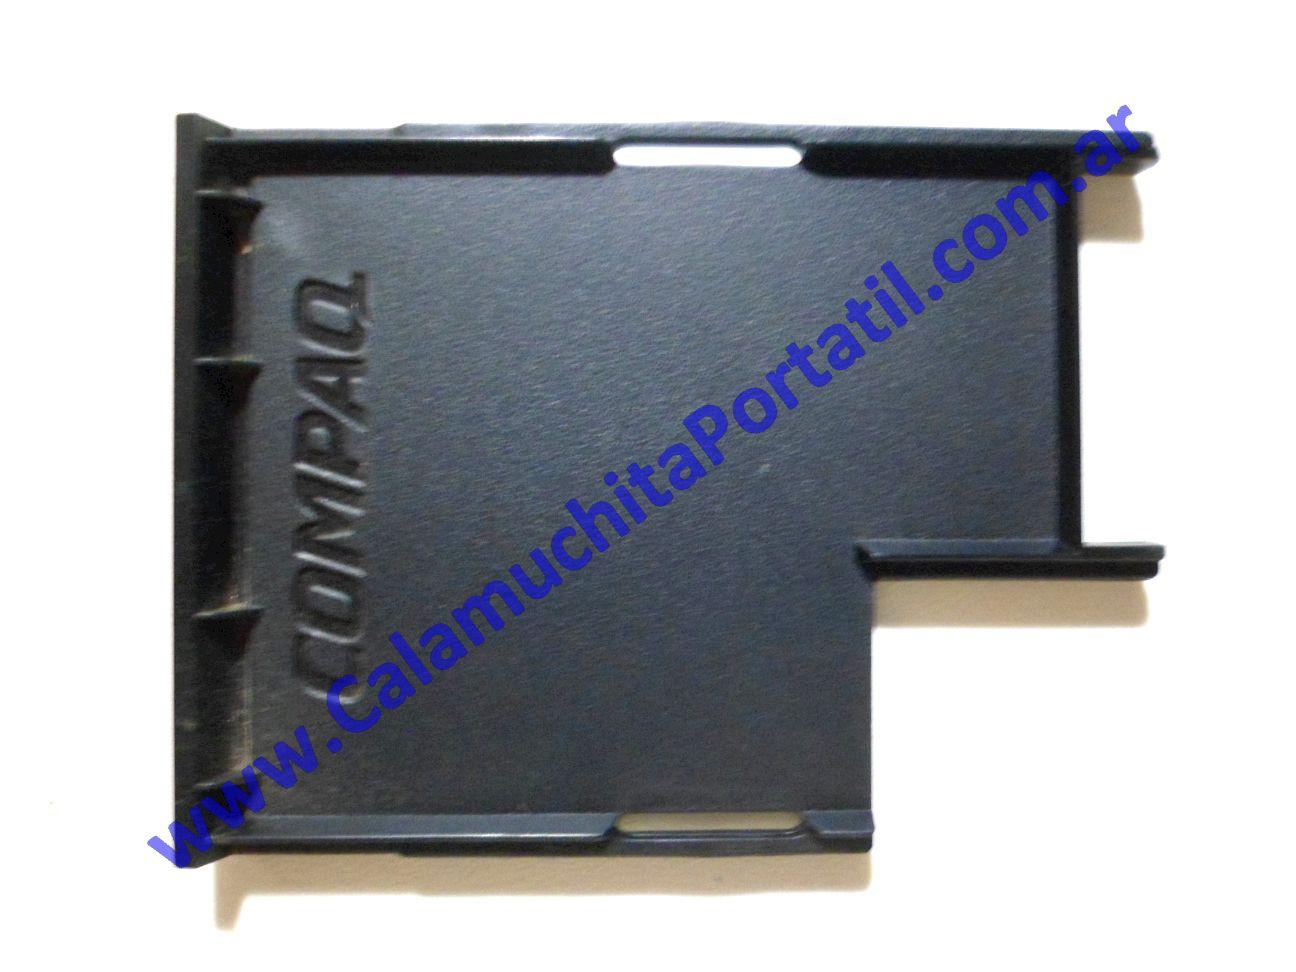 0141XPP Protector PCMCIA Compaq Presario V3500 / V3718LA